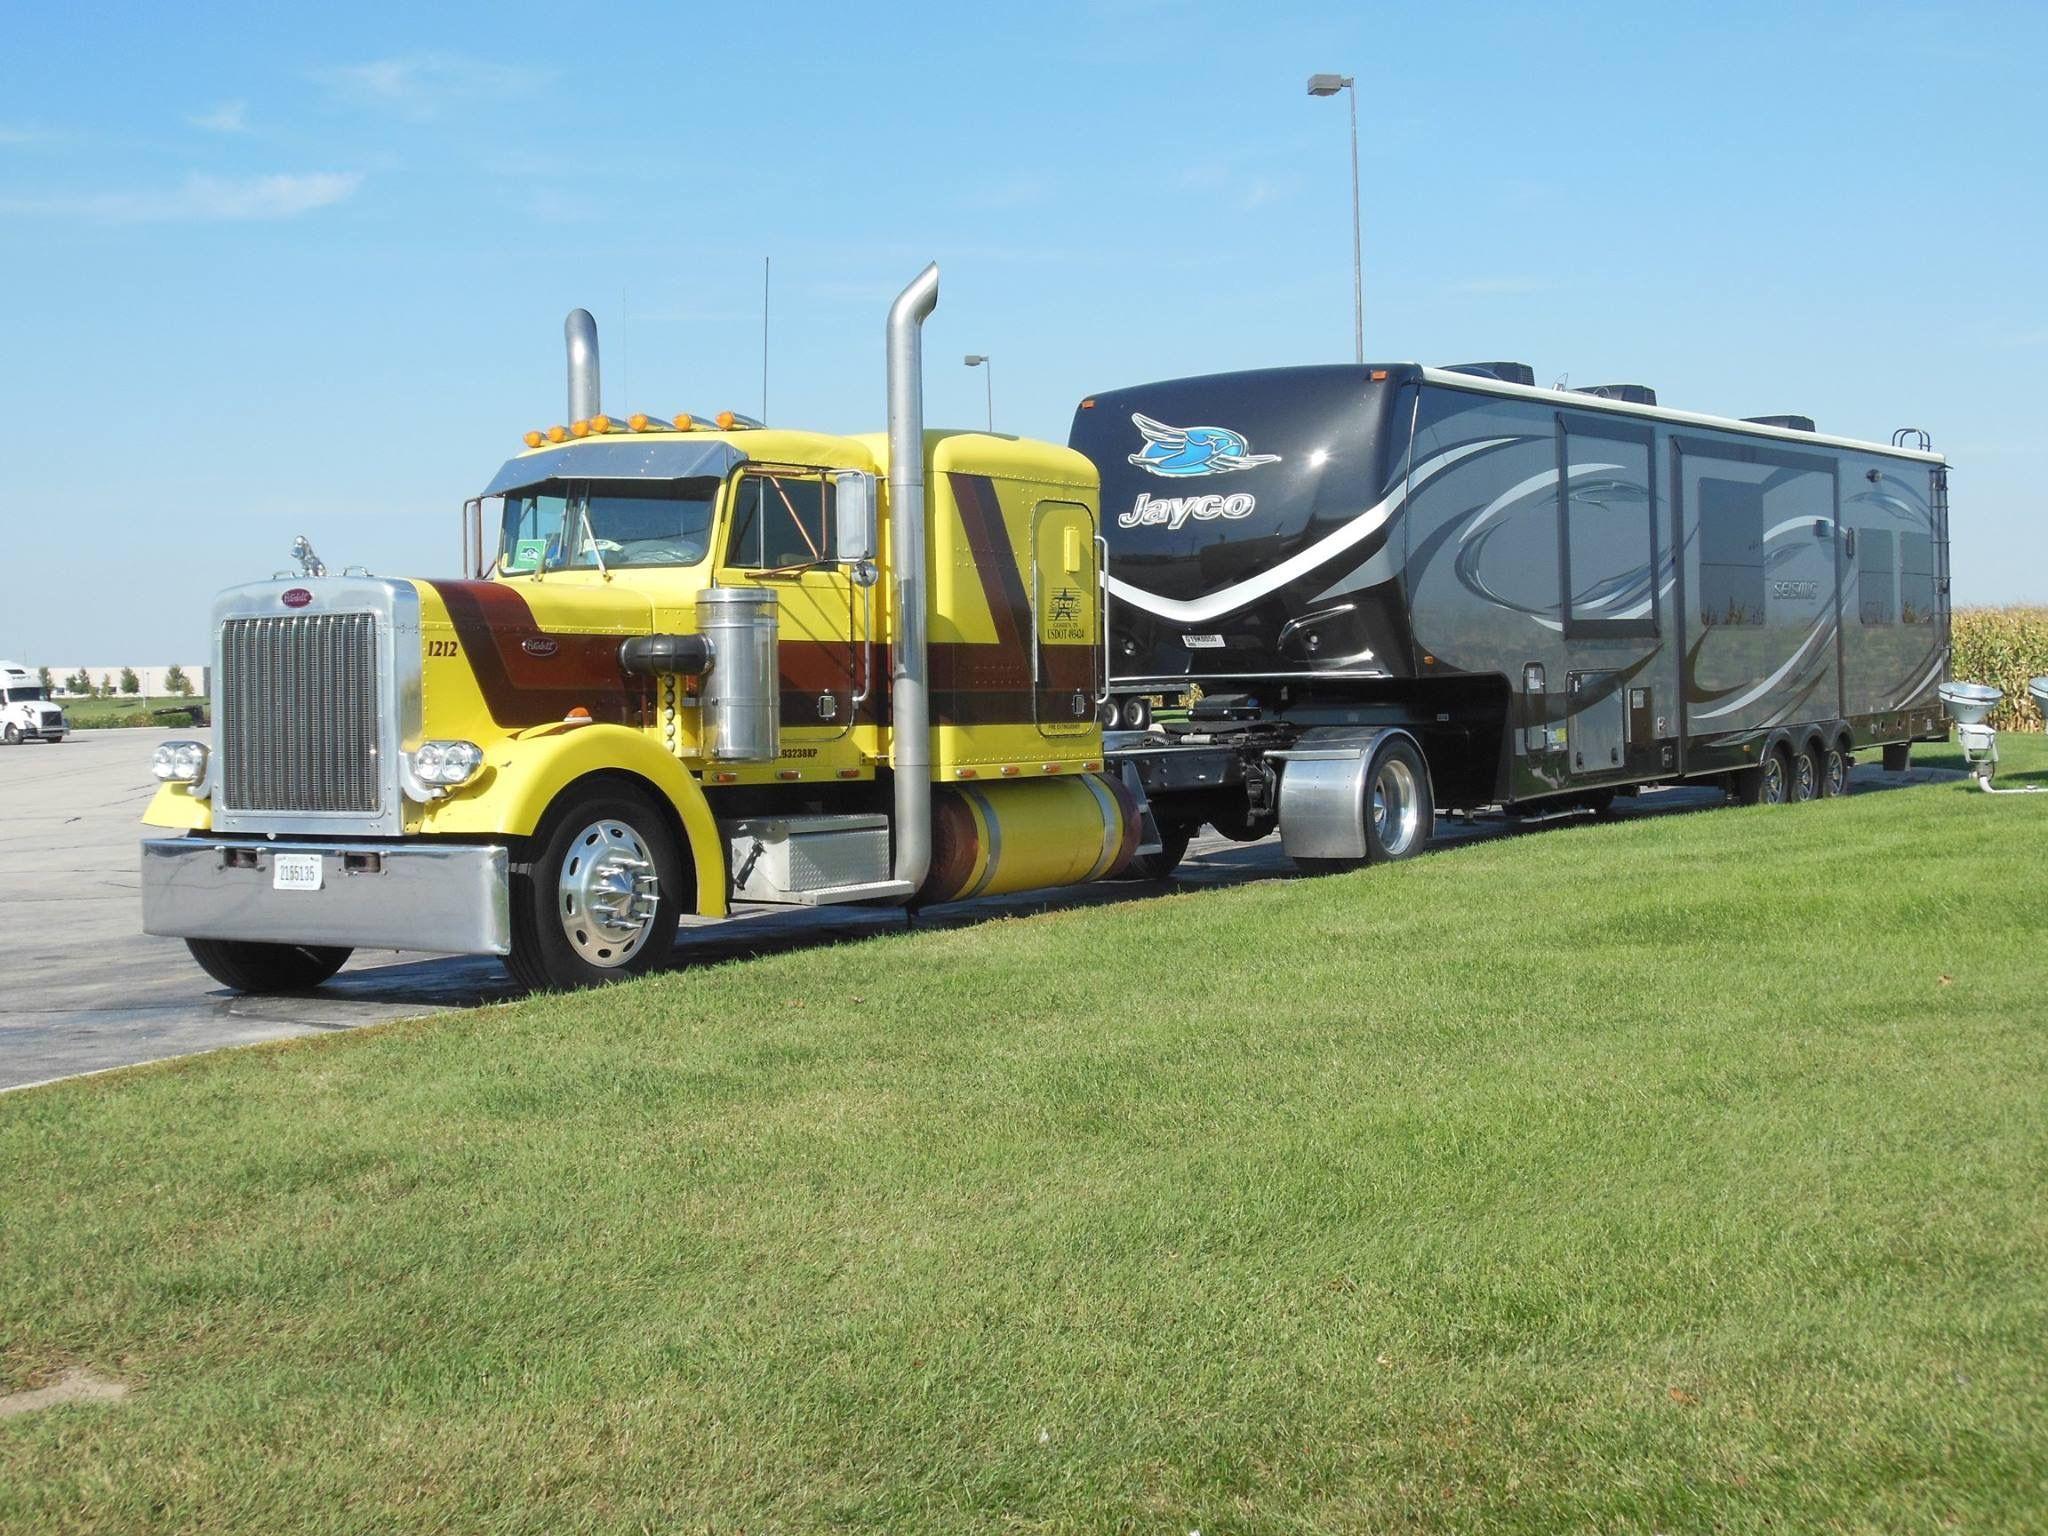 Pin by Gmarlar on Campers ideas Big trucks, Big rig